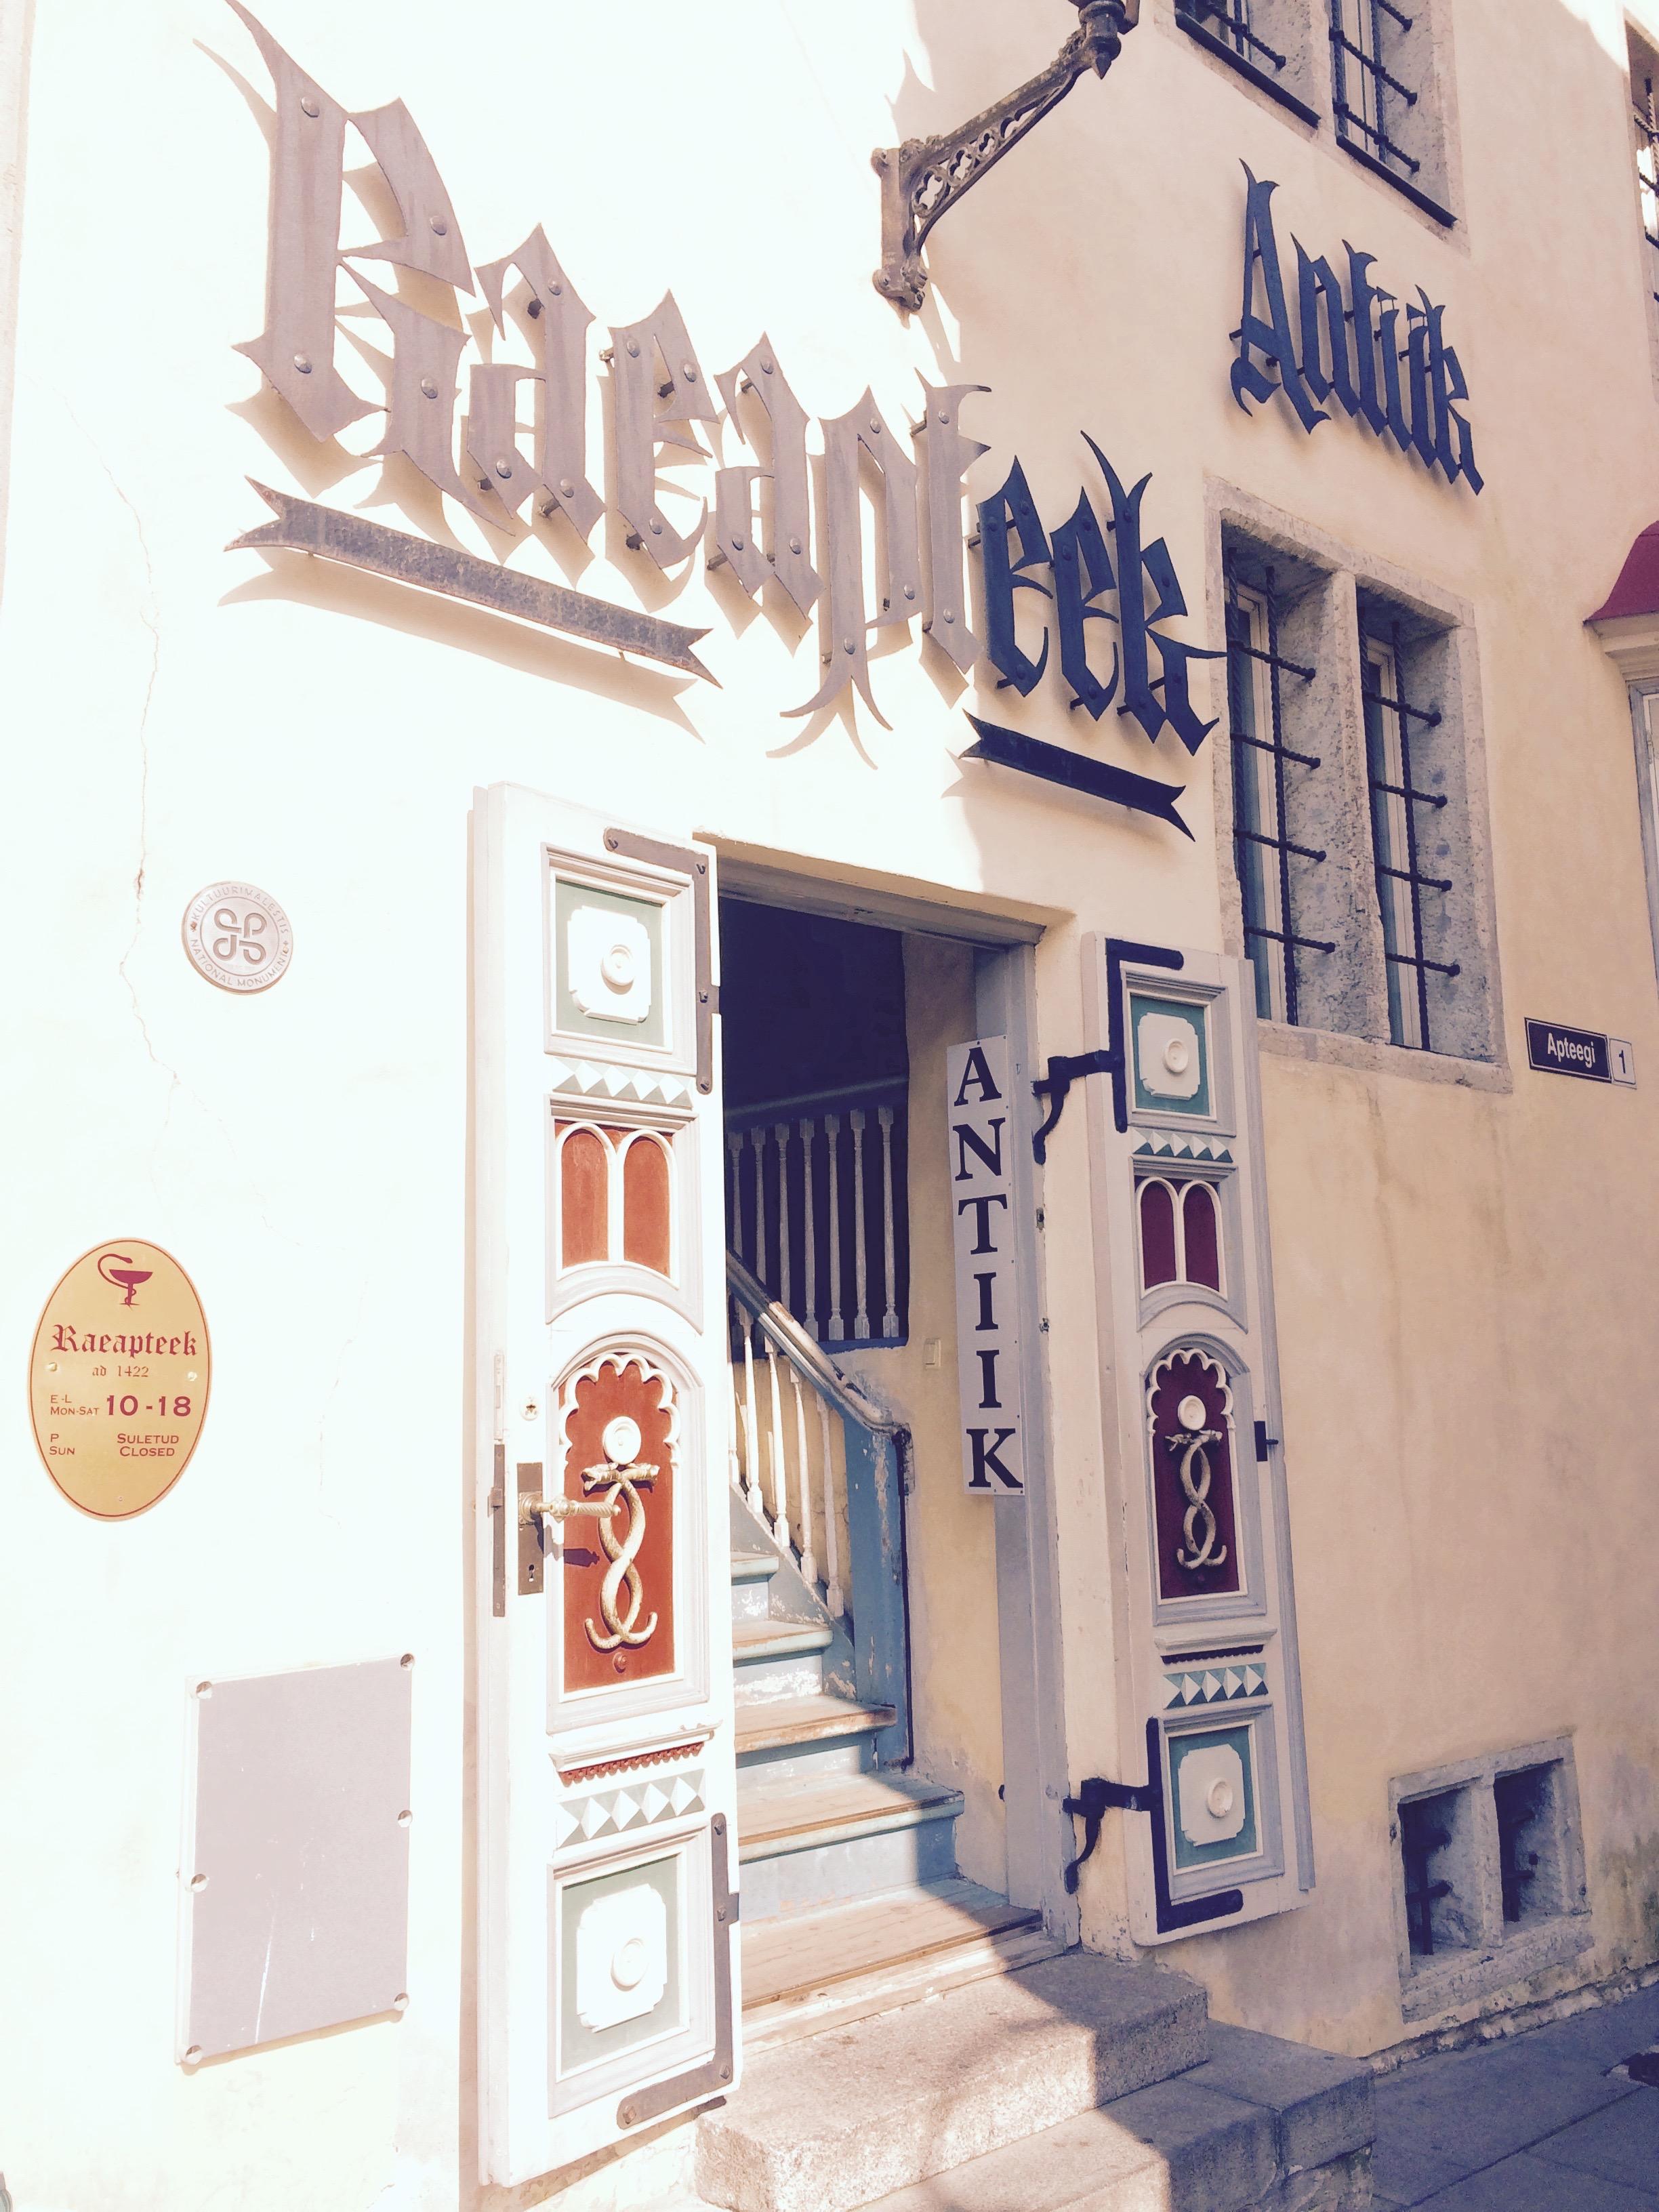 The oldest pharmacy in Tallinn, Estonia